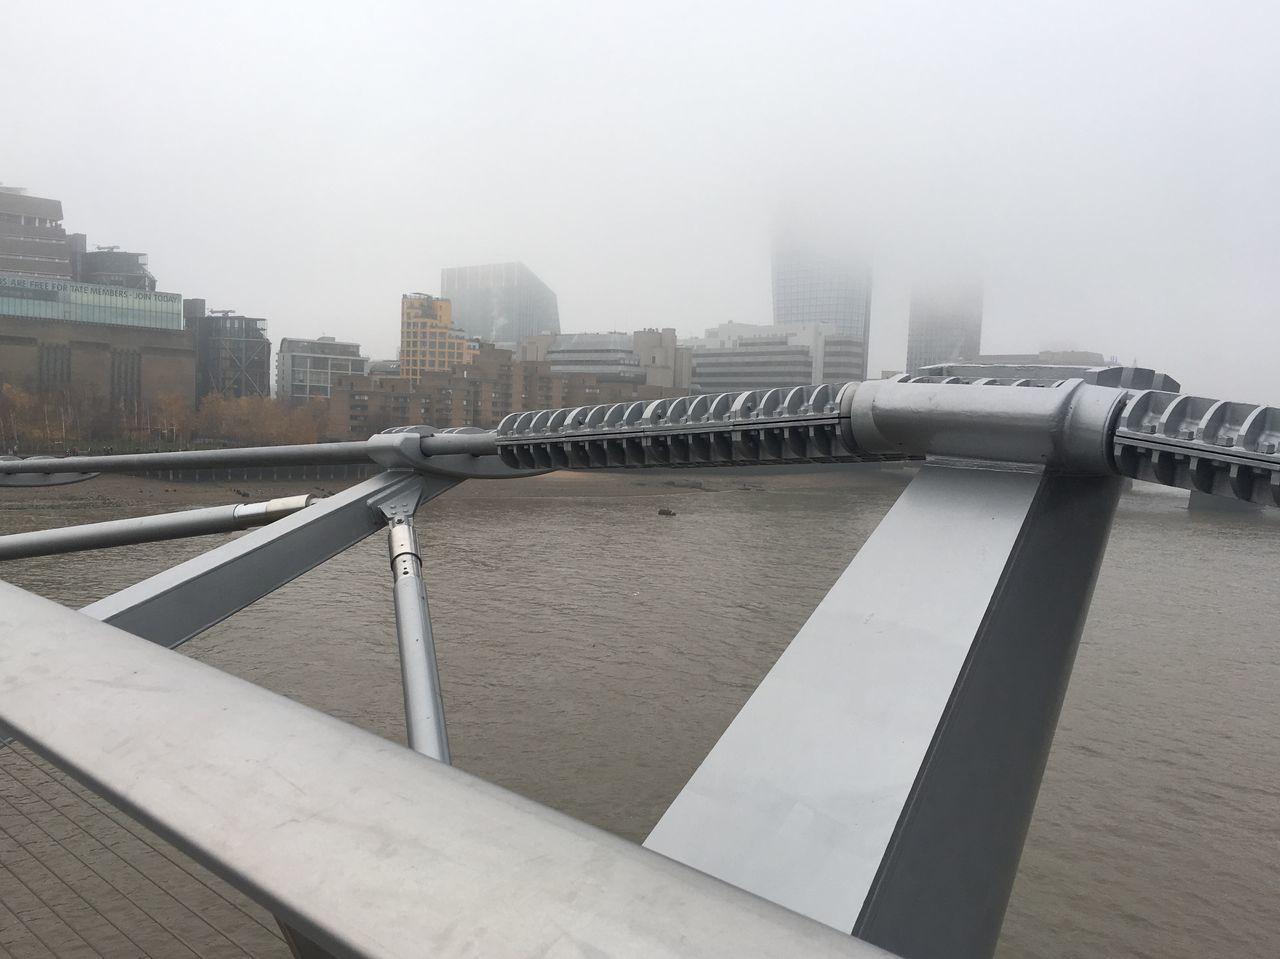 Architecture Bridge - Man Made Structure Built Structure City Cityscape Day Fog Millenium Bridge No People Outdoors River Thames Sky Urban Skyline Water